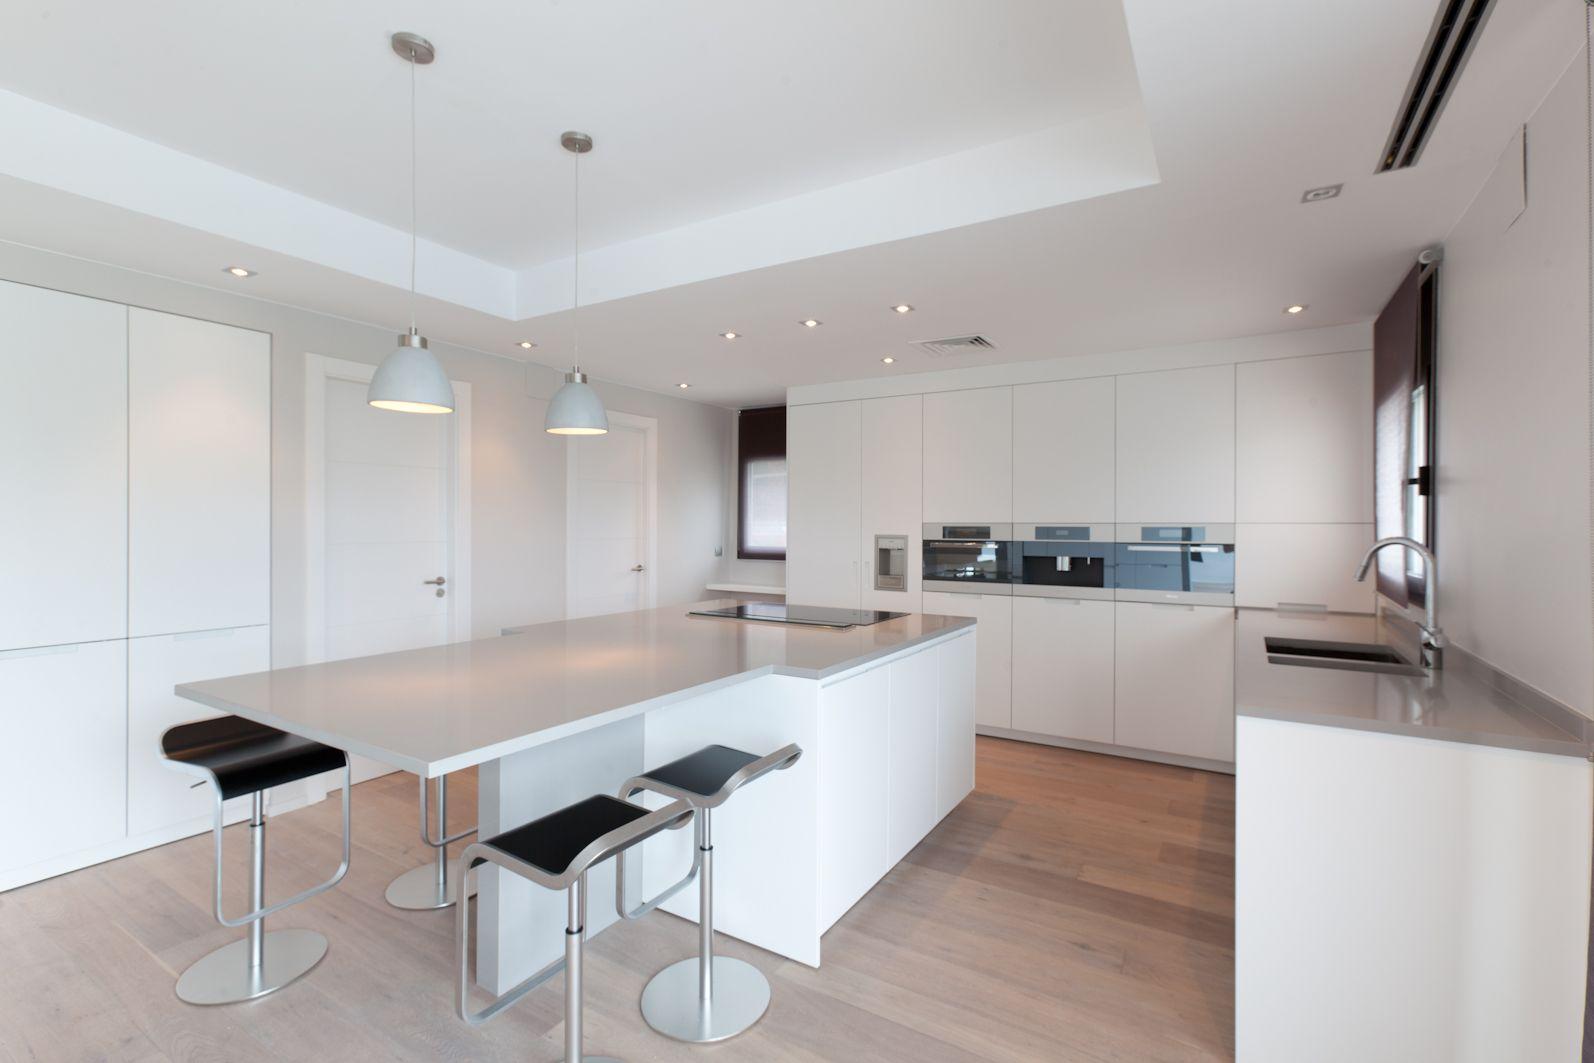 Cocina estilo moderno color marron blanco negro casa for Cocina estilo moderno